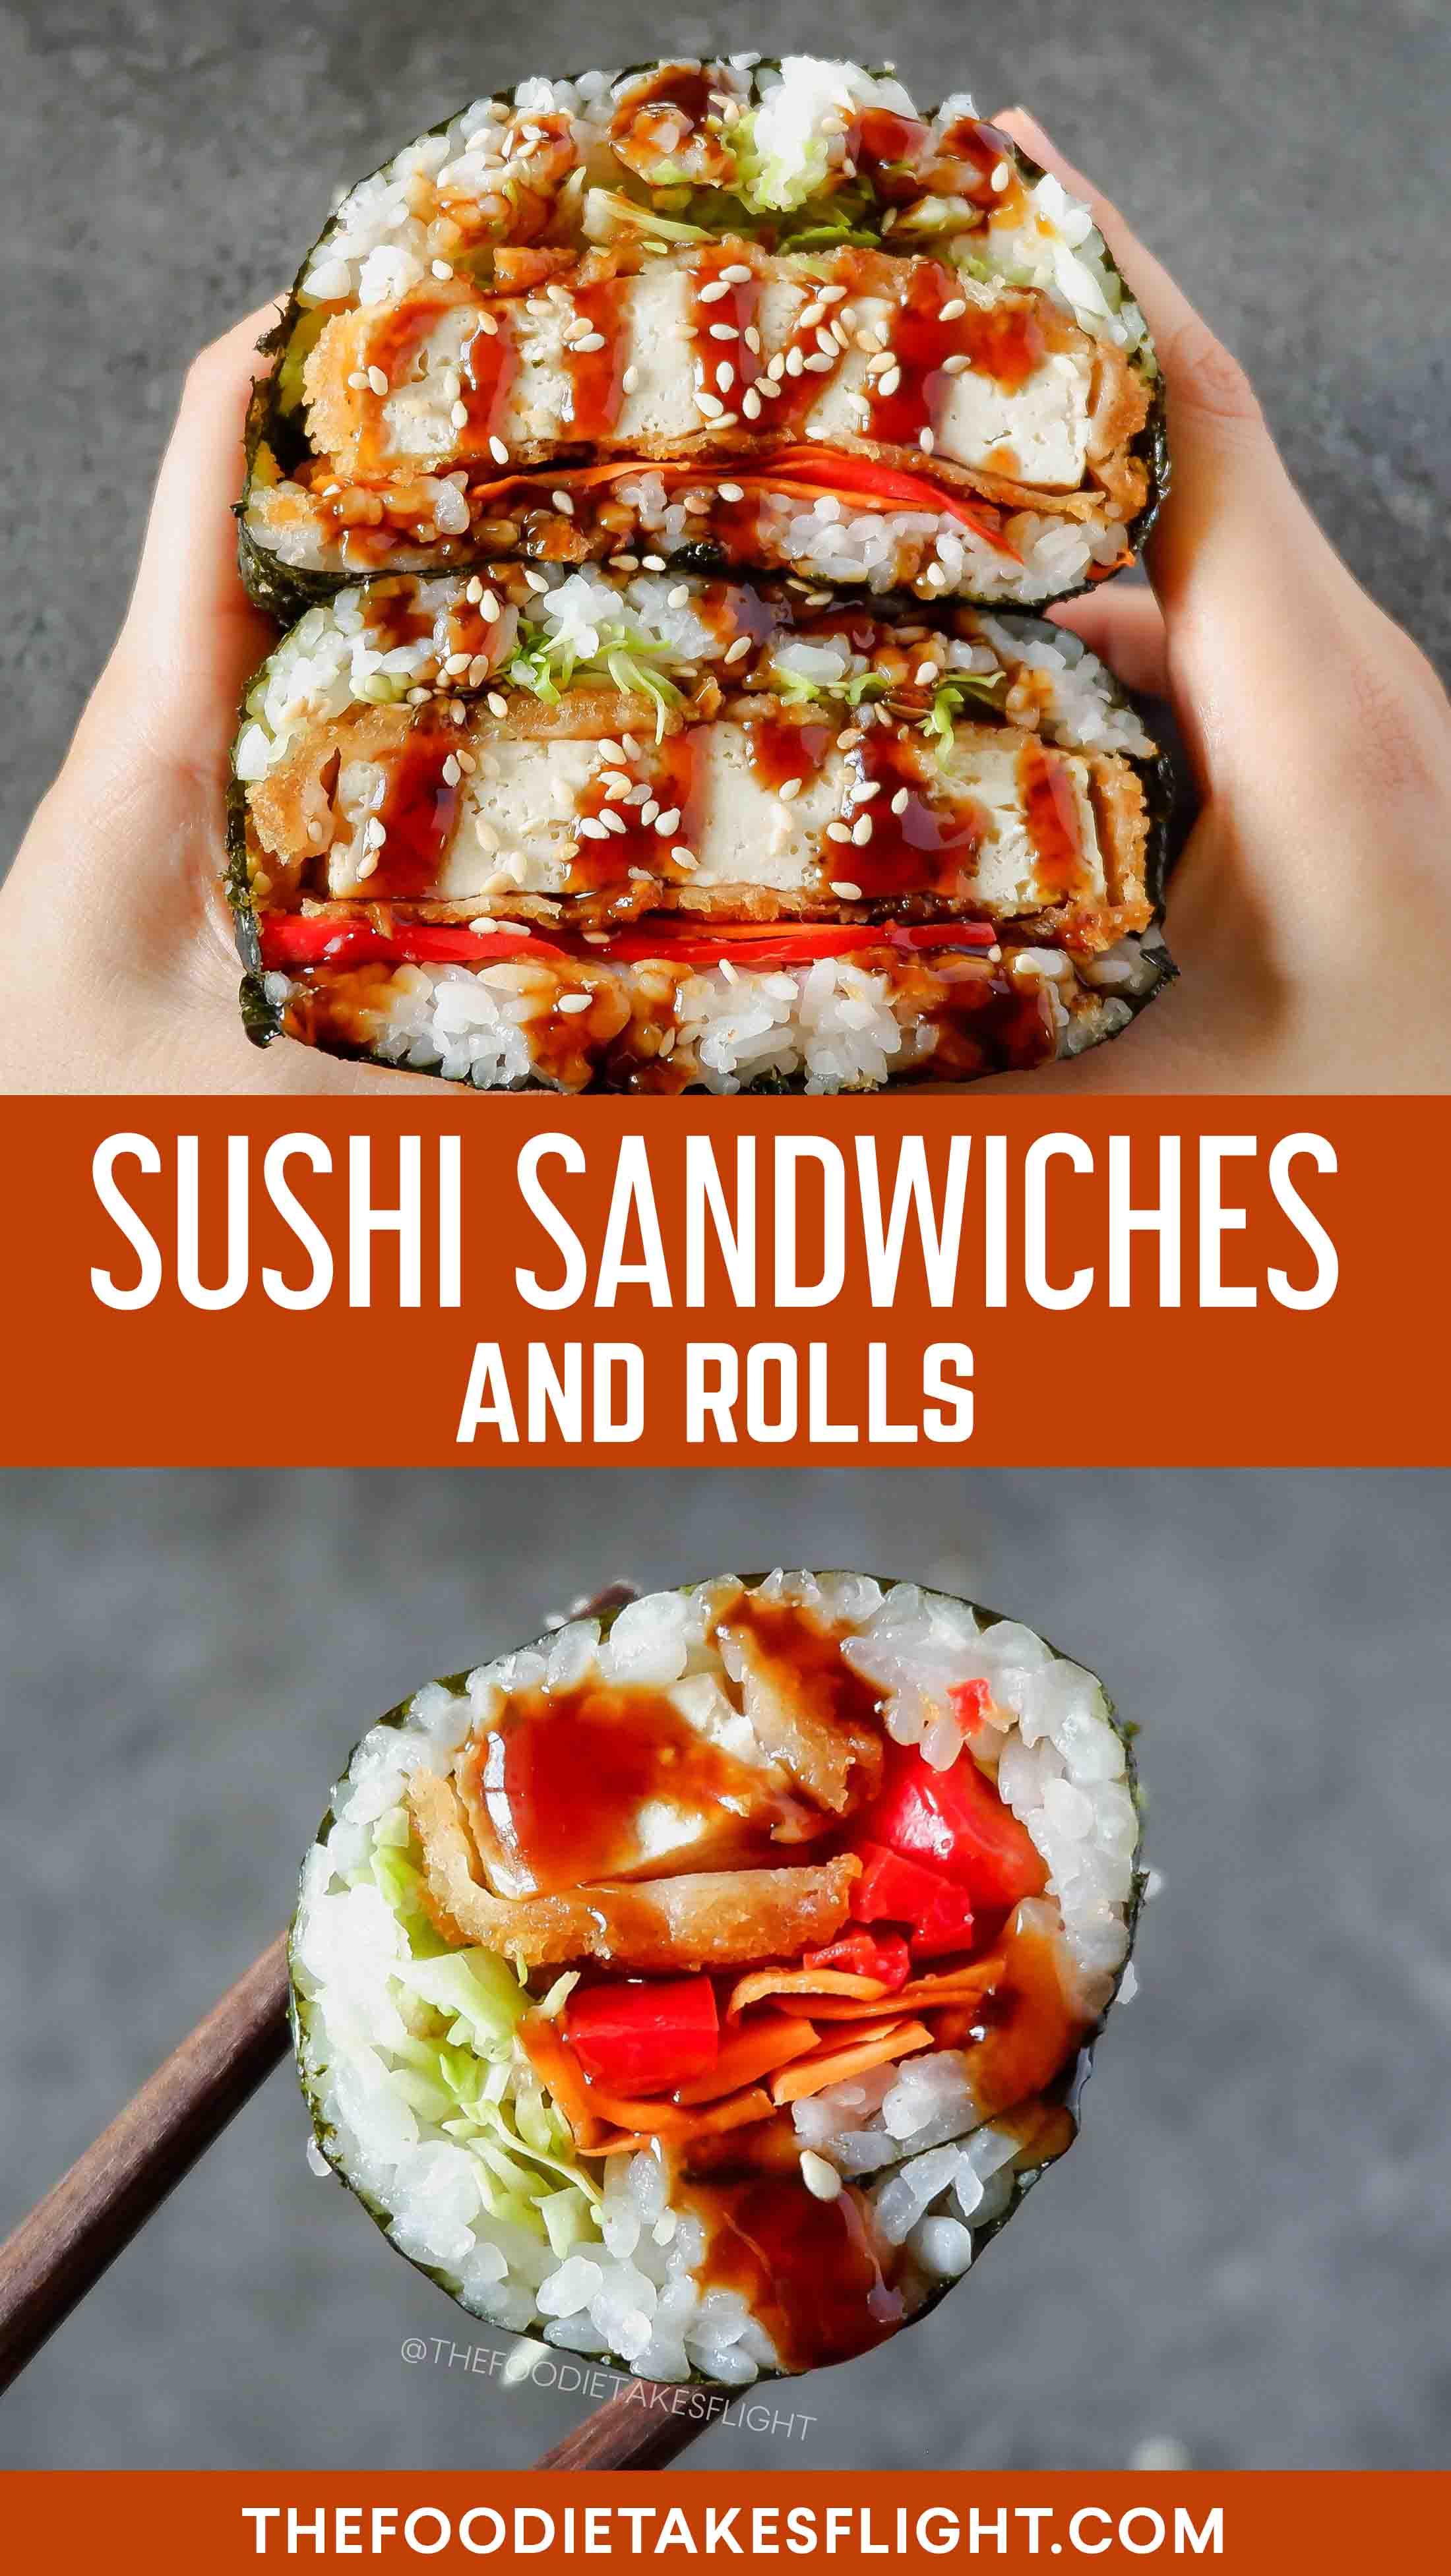 Vegan Tofu Katsu Sushi Sandwiches Onigirazu And Rolls Recipe In 2020 Sushi Sandwich Vegetable Dishes Vegetarian Recipes